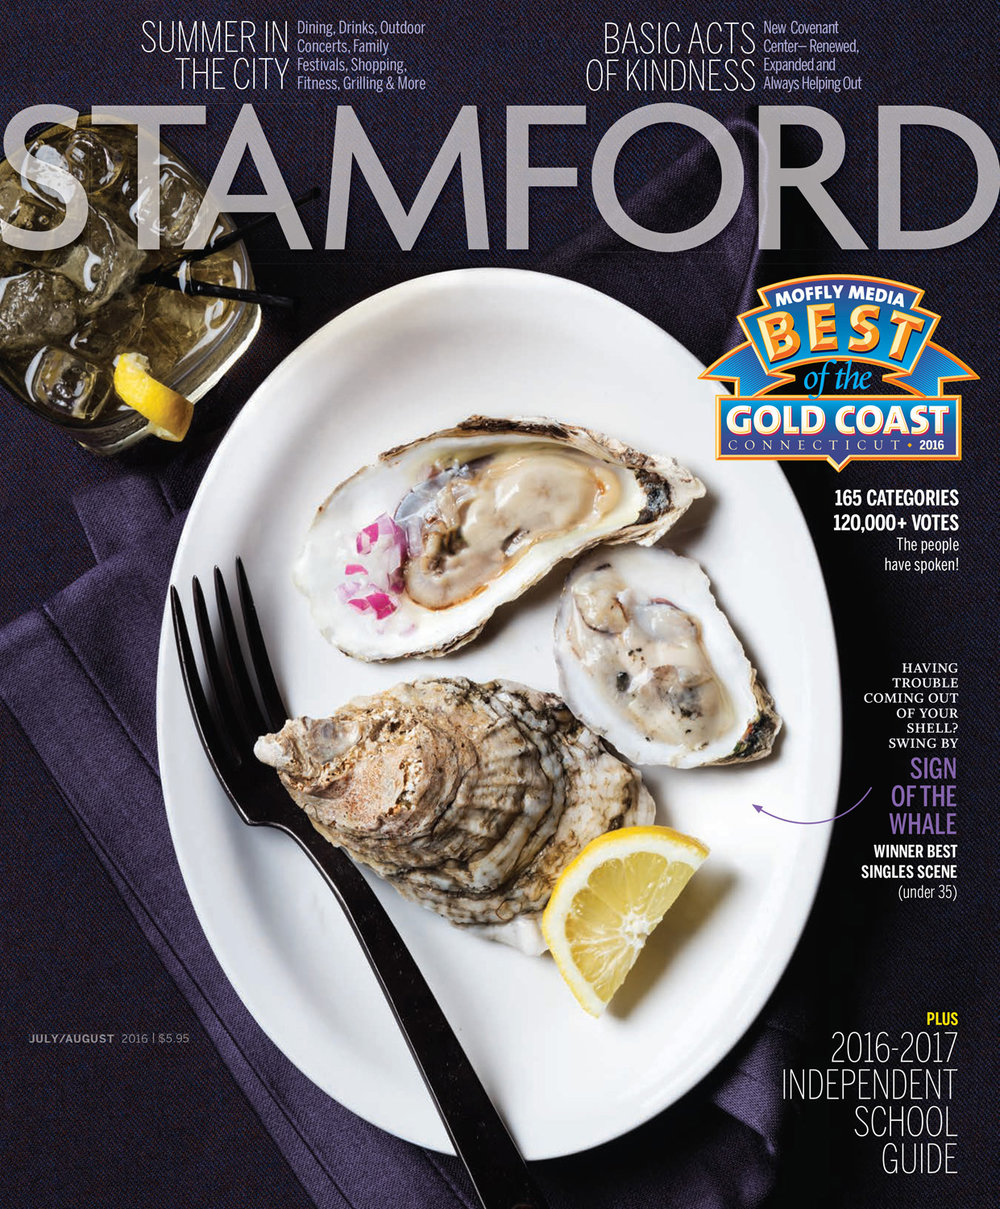 Stamford Magazine July/August 2016